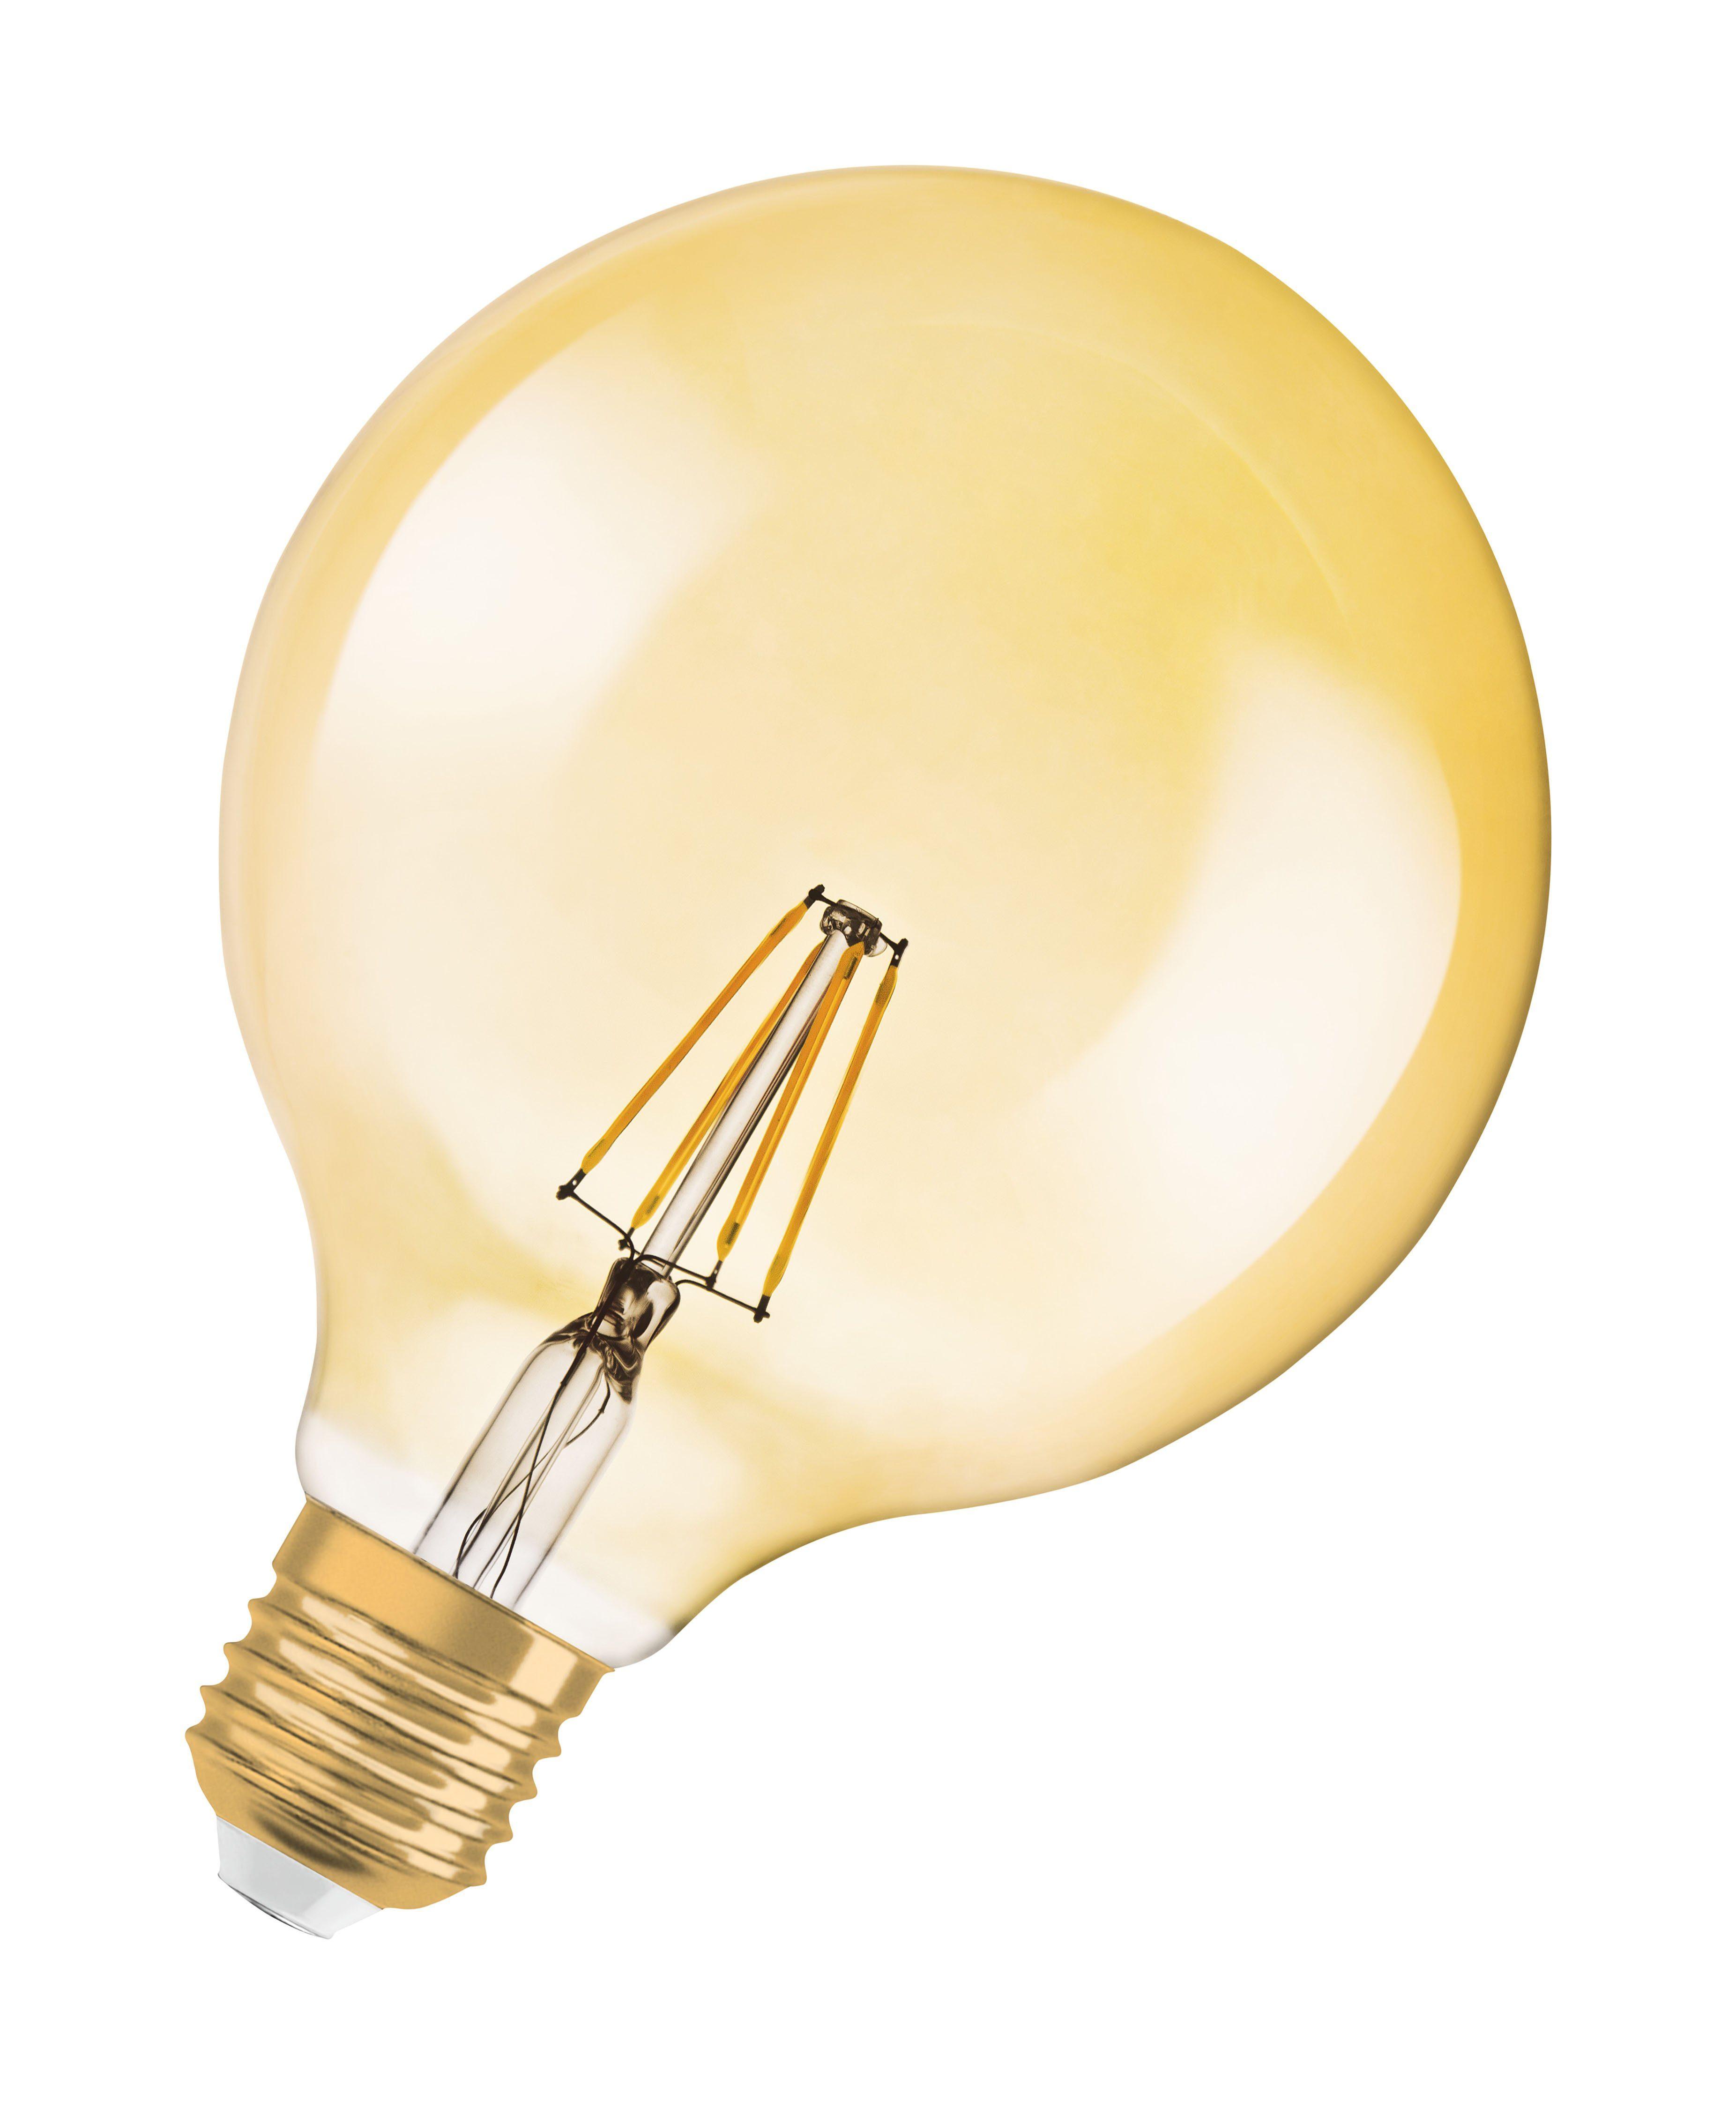 Osram Vintage 1906 LED-Lampe, klassische Ballform, dimmbar »ST GLOBE 51 6.5 W/824 E27«